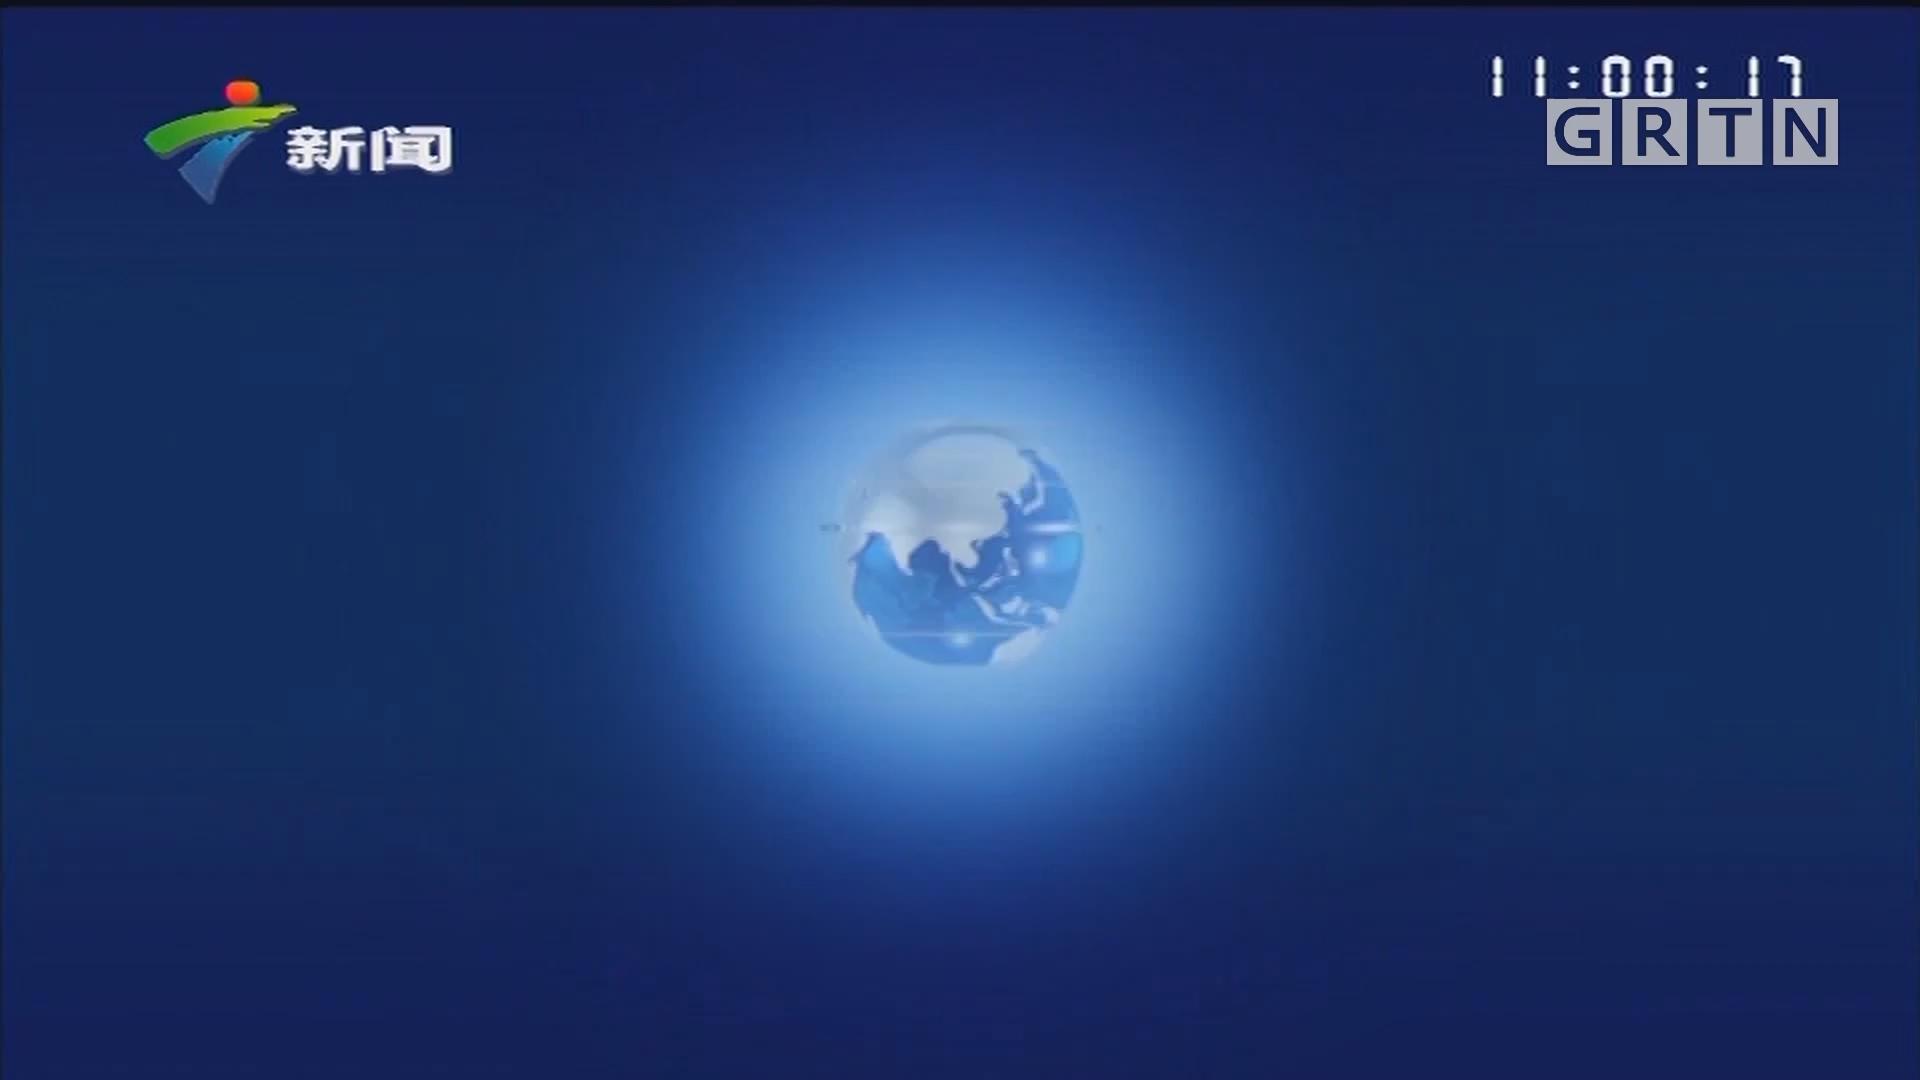 [HD][2019-11-15]正點播報:2019粵港澳大灣區知交會落幕 促成知識產權交易逾17億元